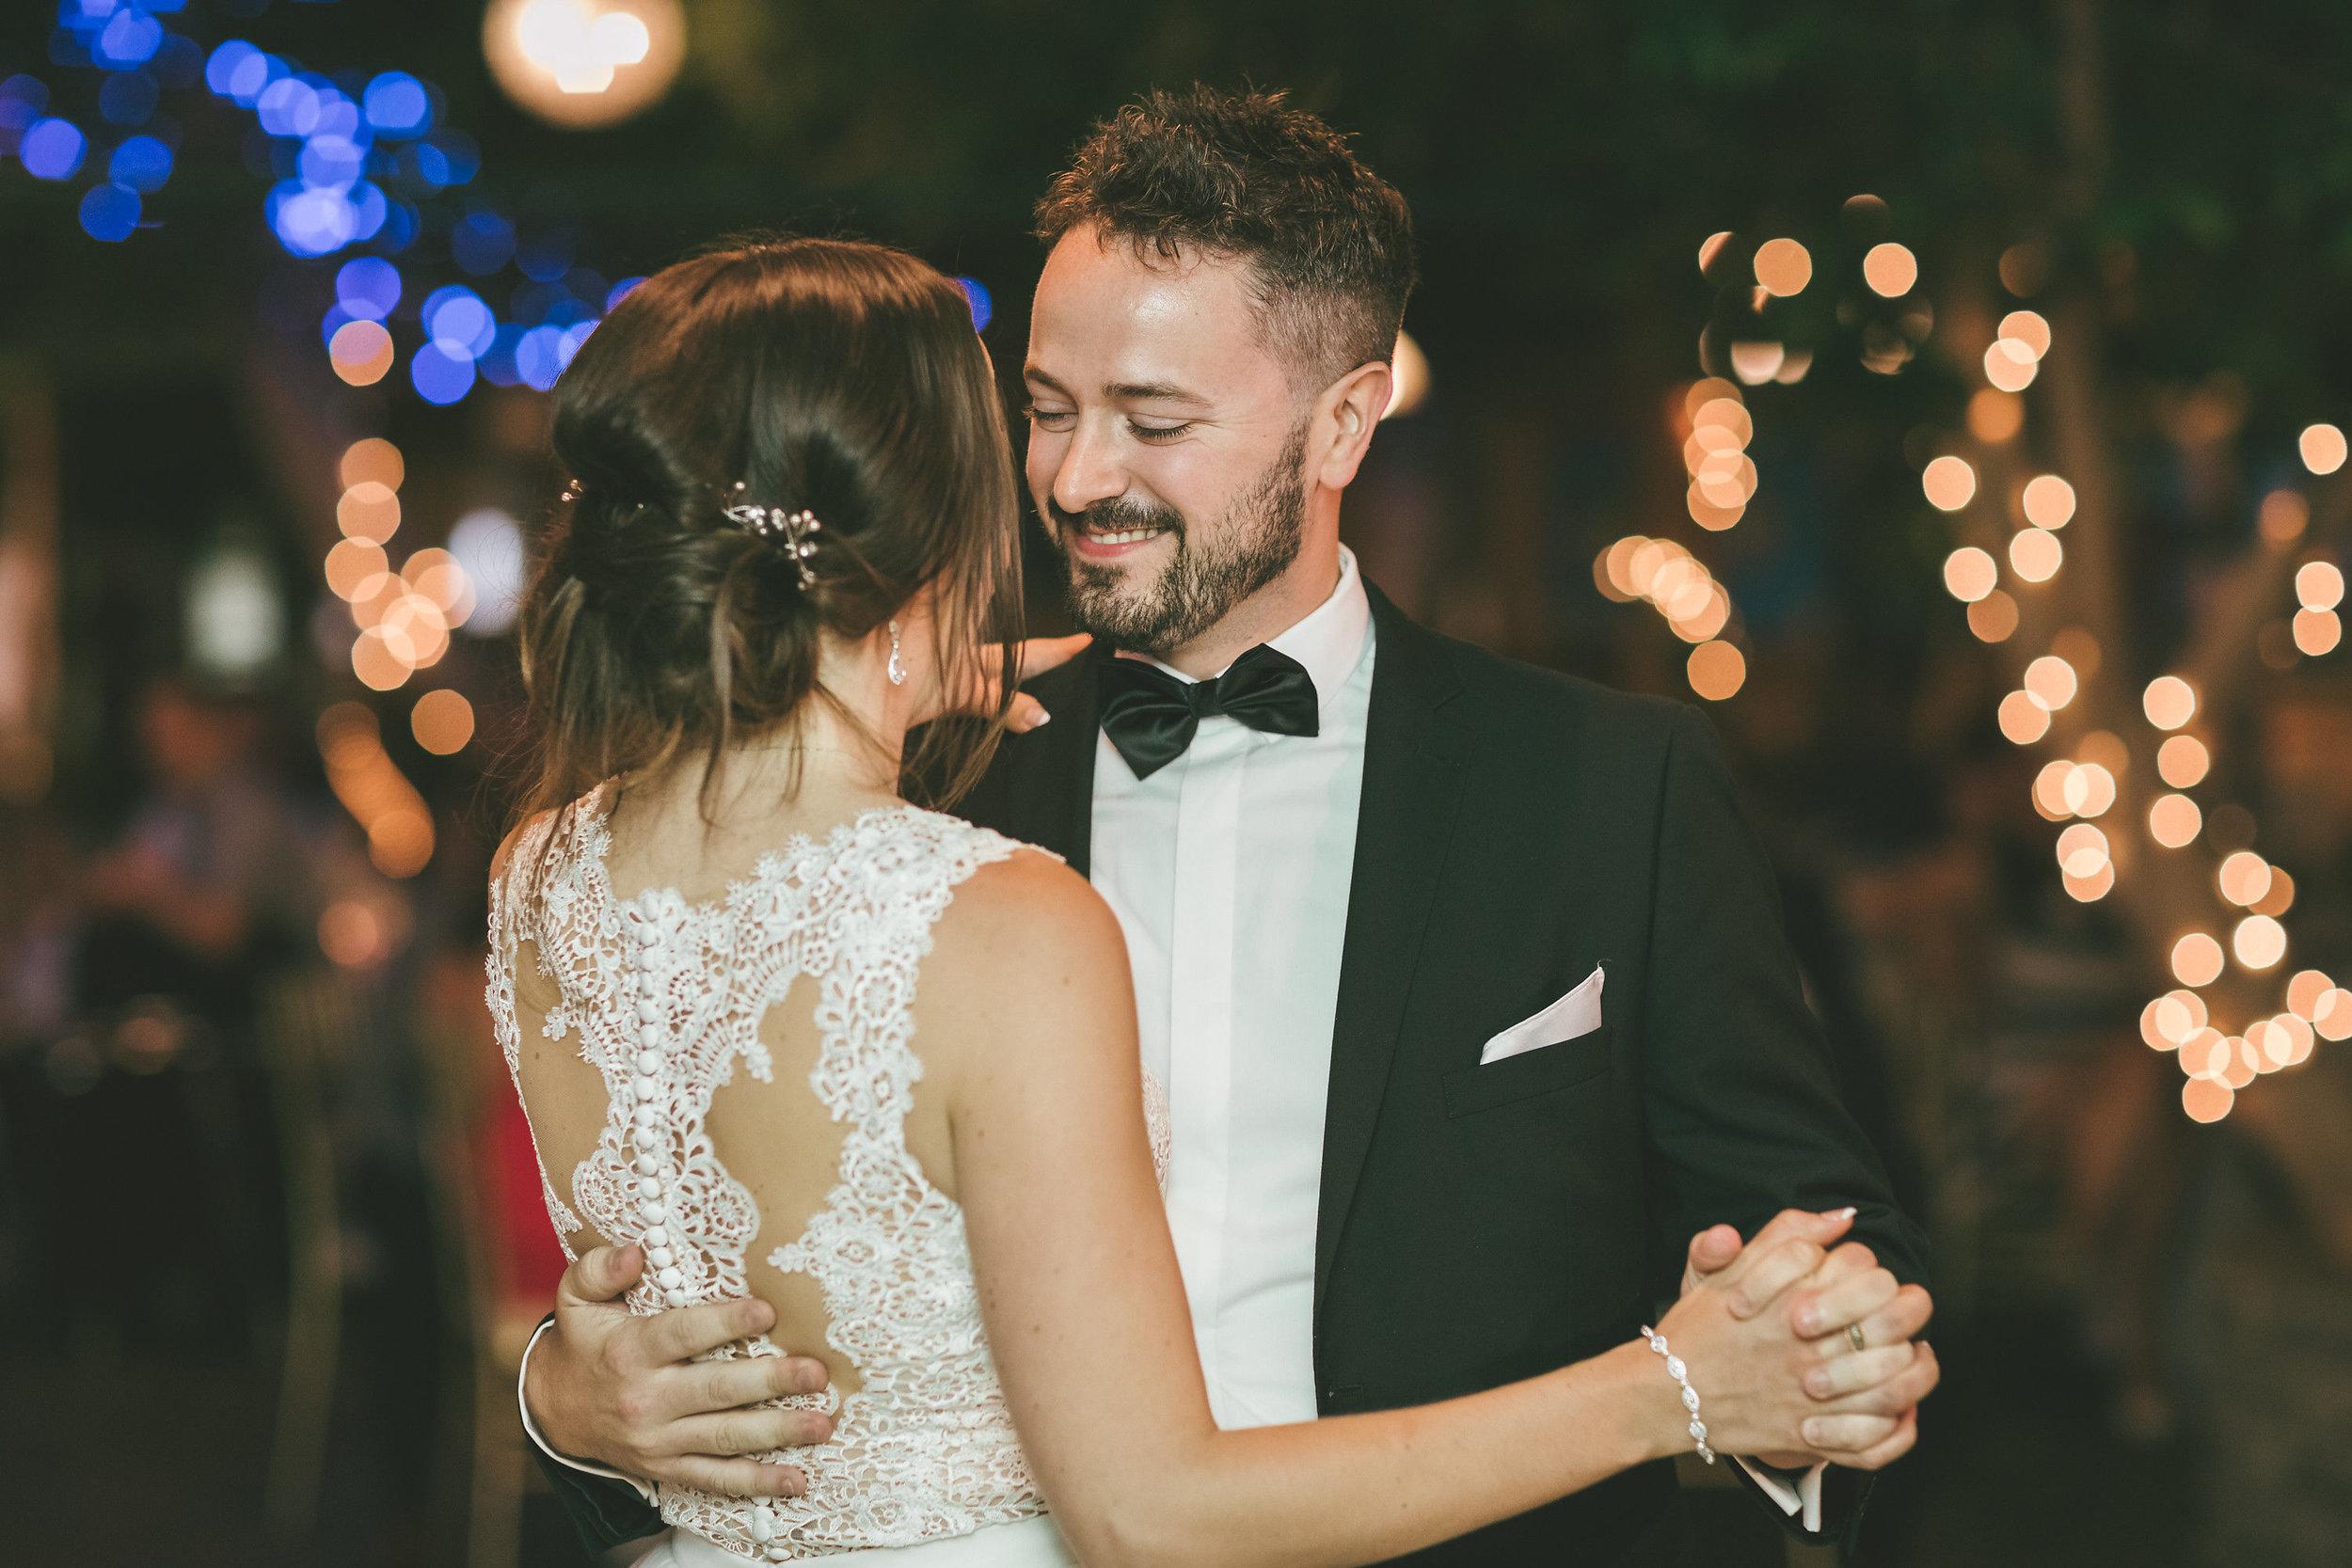 gosia___mike_wedding___lifesreel_danielcaruso___1495.jpg